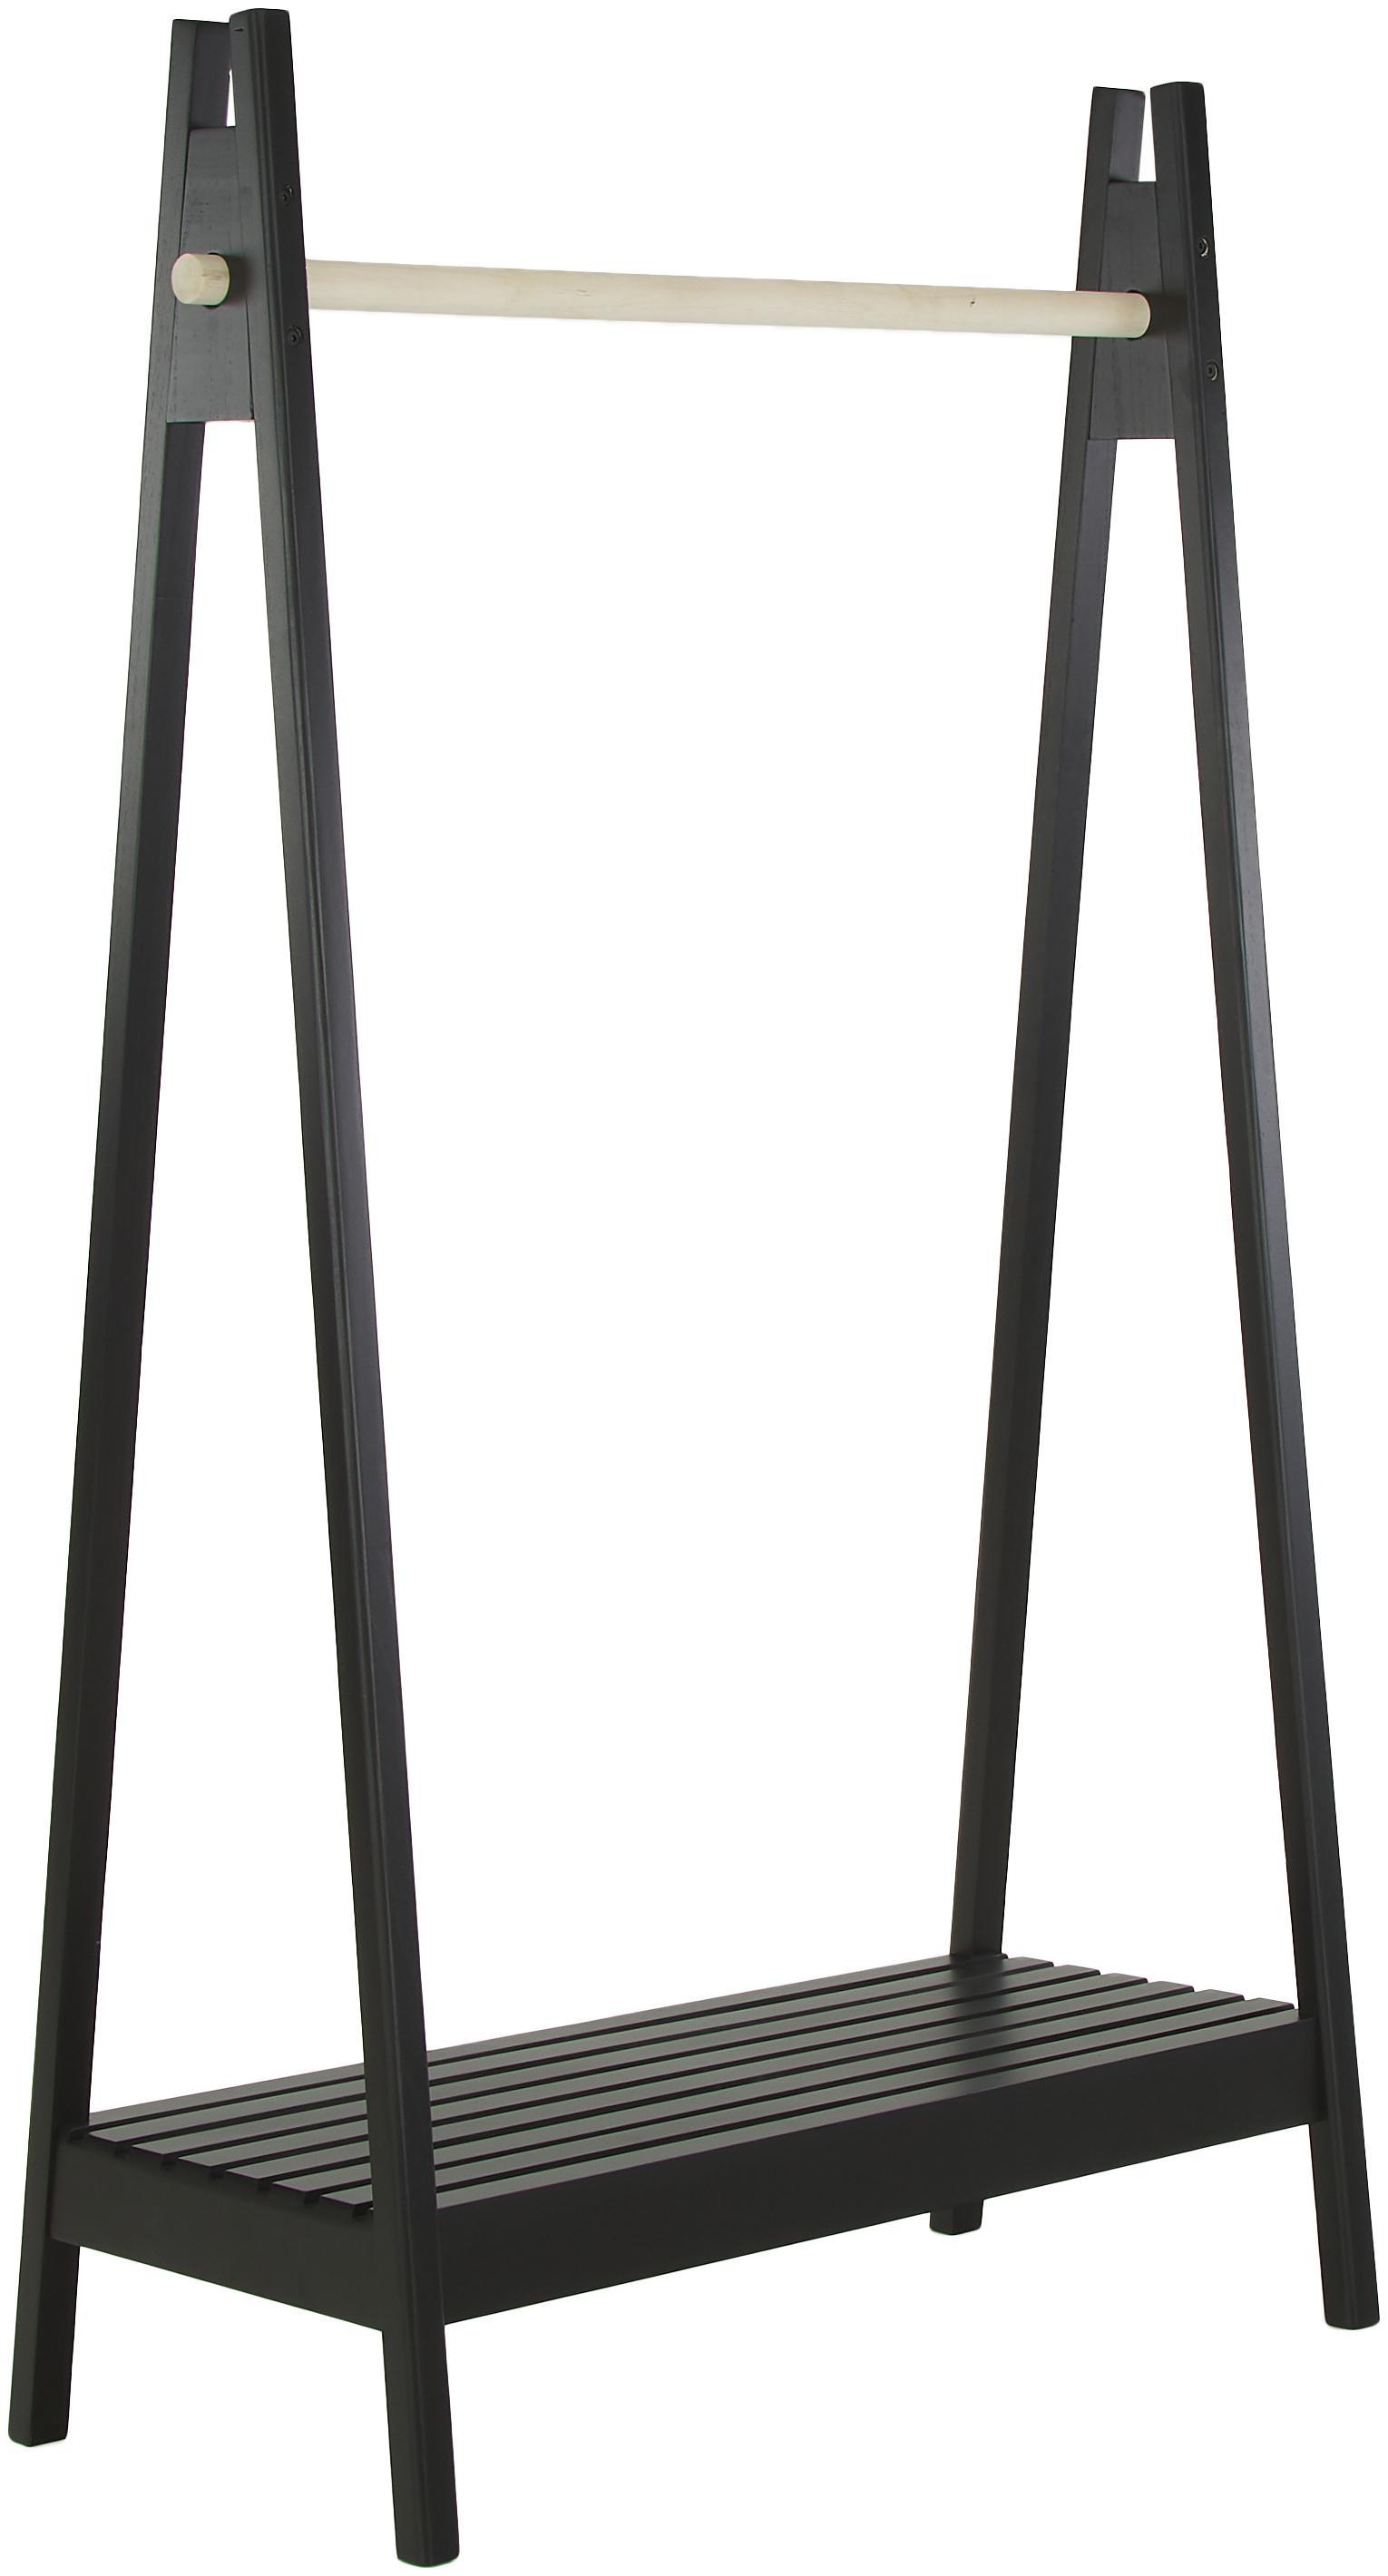 Kapstok Torino van hout, Paulowniahout, MDF, Wit met zwarte vlekken, B 95 x D 39 cm